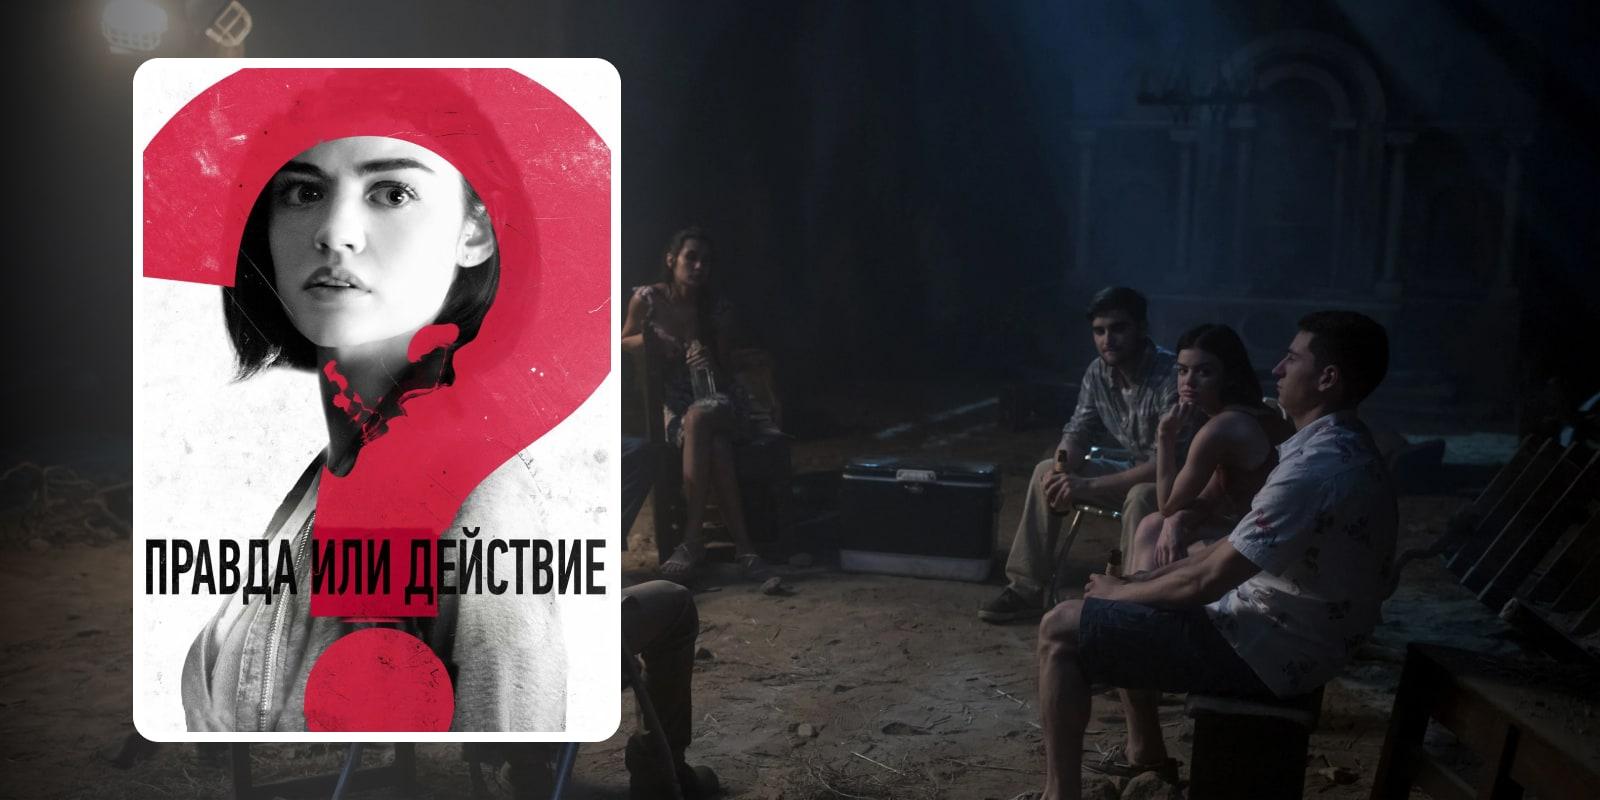 Правда или действие (2018) Truth or Dare